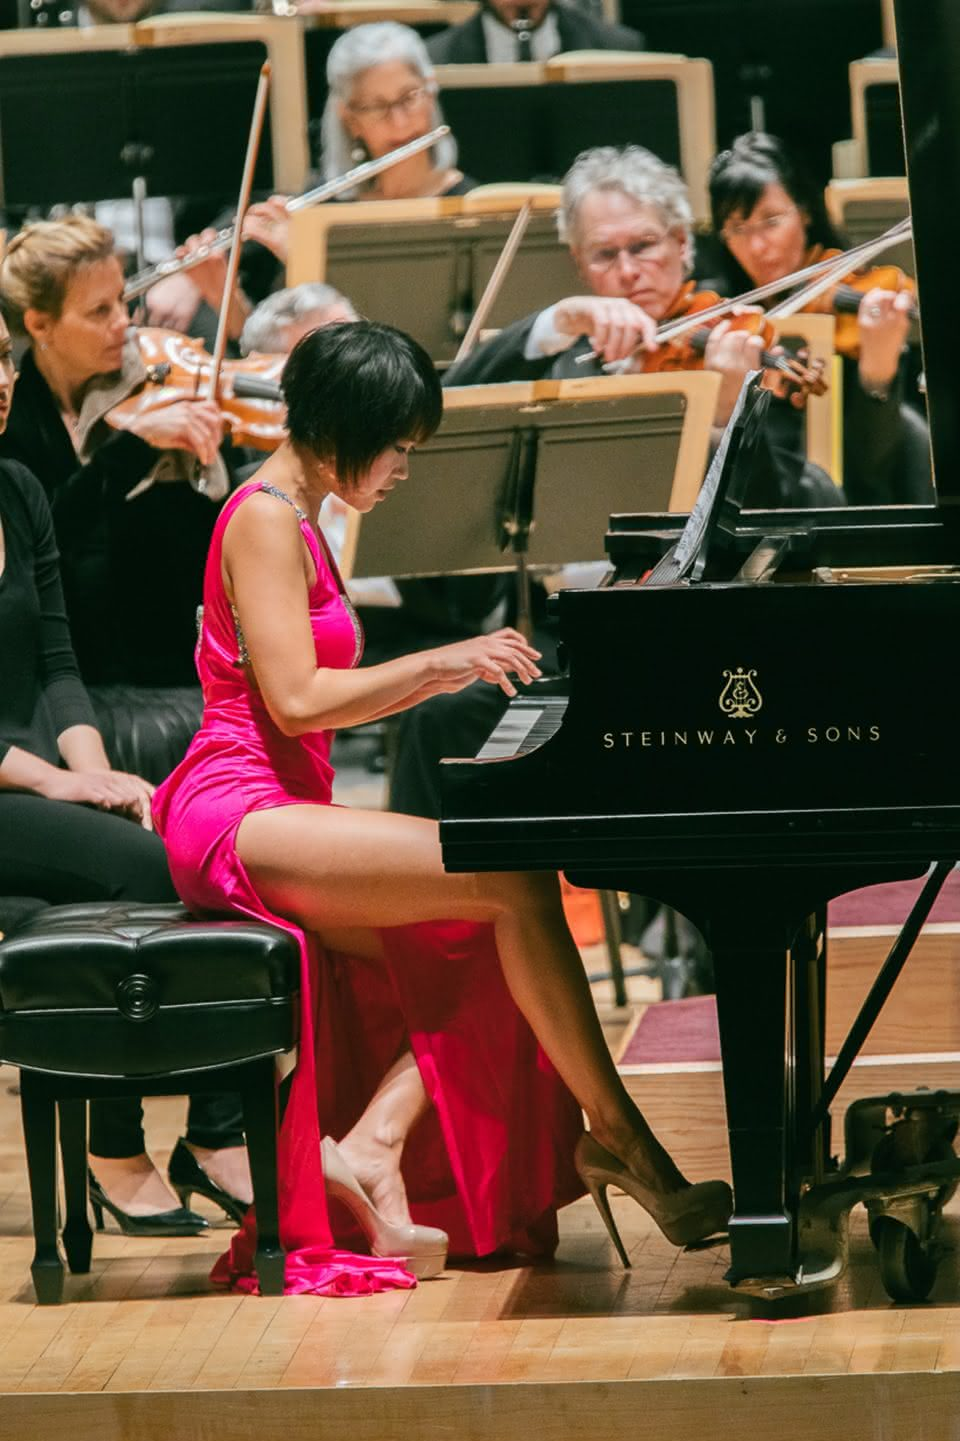 Rachmaninov / Scriabin / Ligeti / Prokofiev: The Berlin Recital (Yuja Wang)